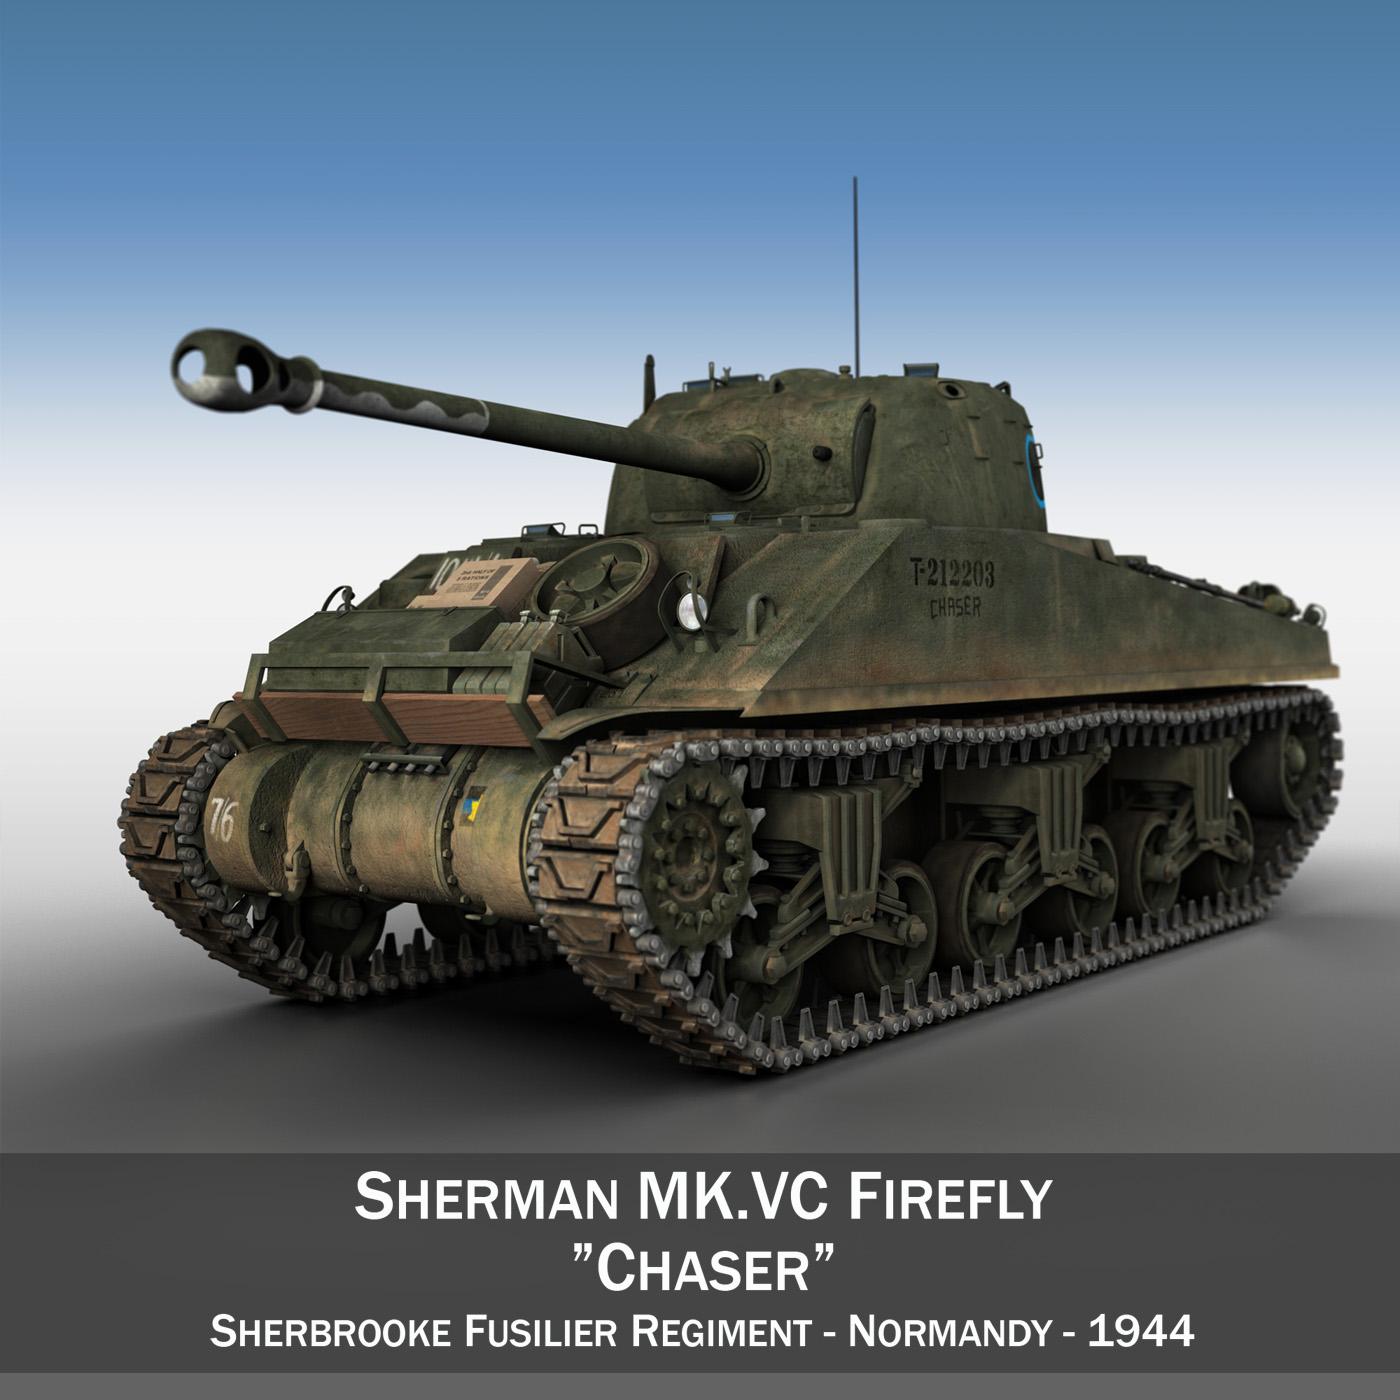 sherman mk vc firefly - griezējs 3d modelis 3ds fwx lwo lws obj c4d 265504